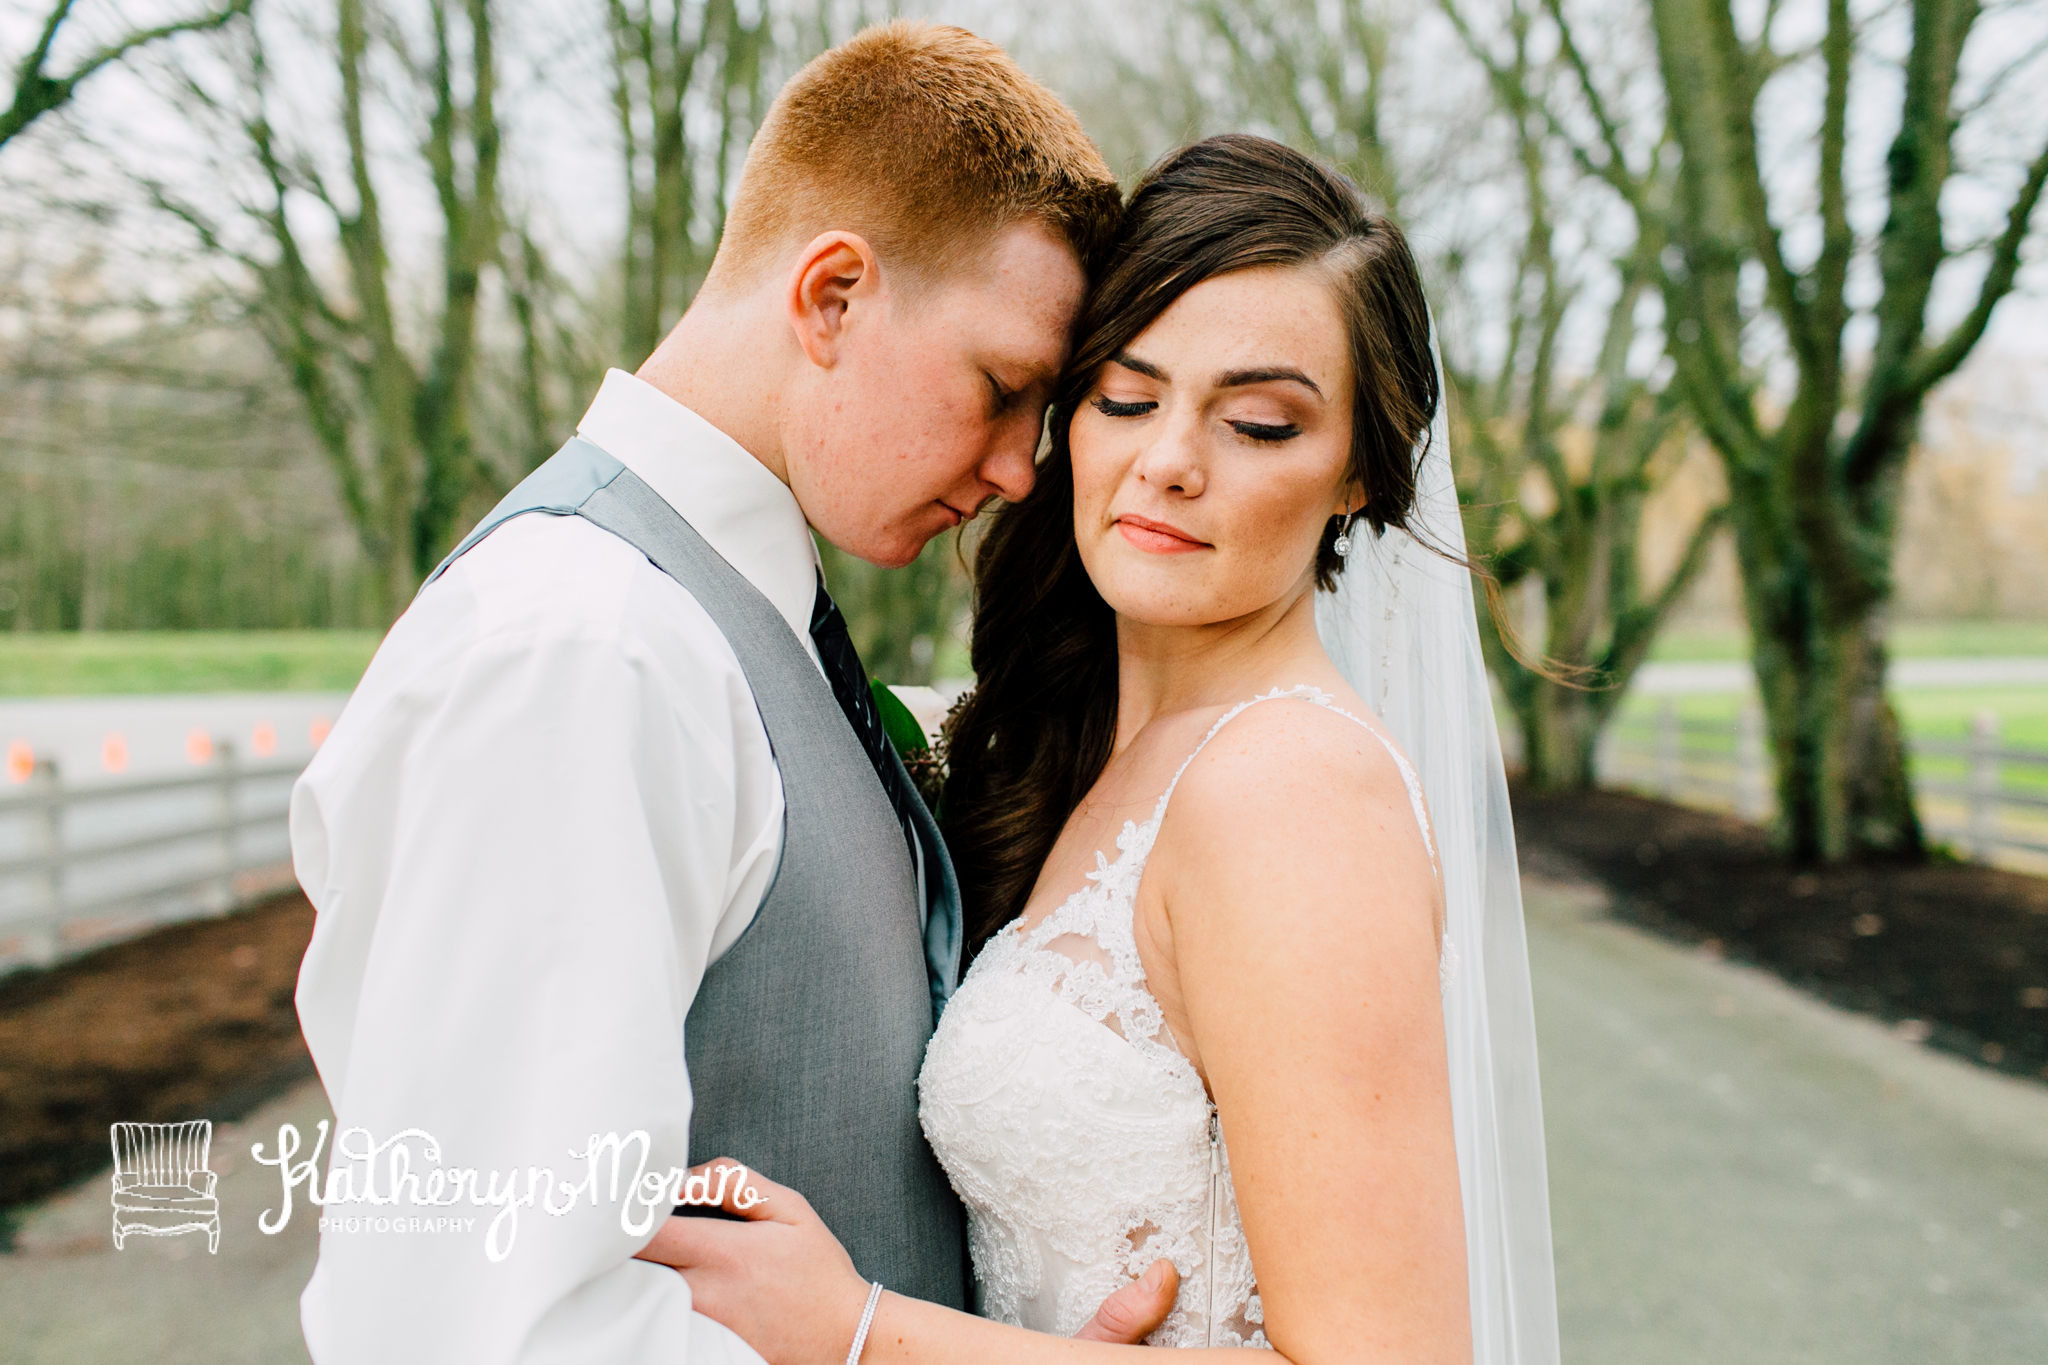 maplehurst-farm-wedding-katheryn-moran-photography-koogle-8.jpg